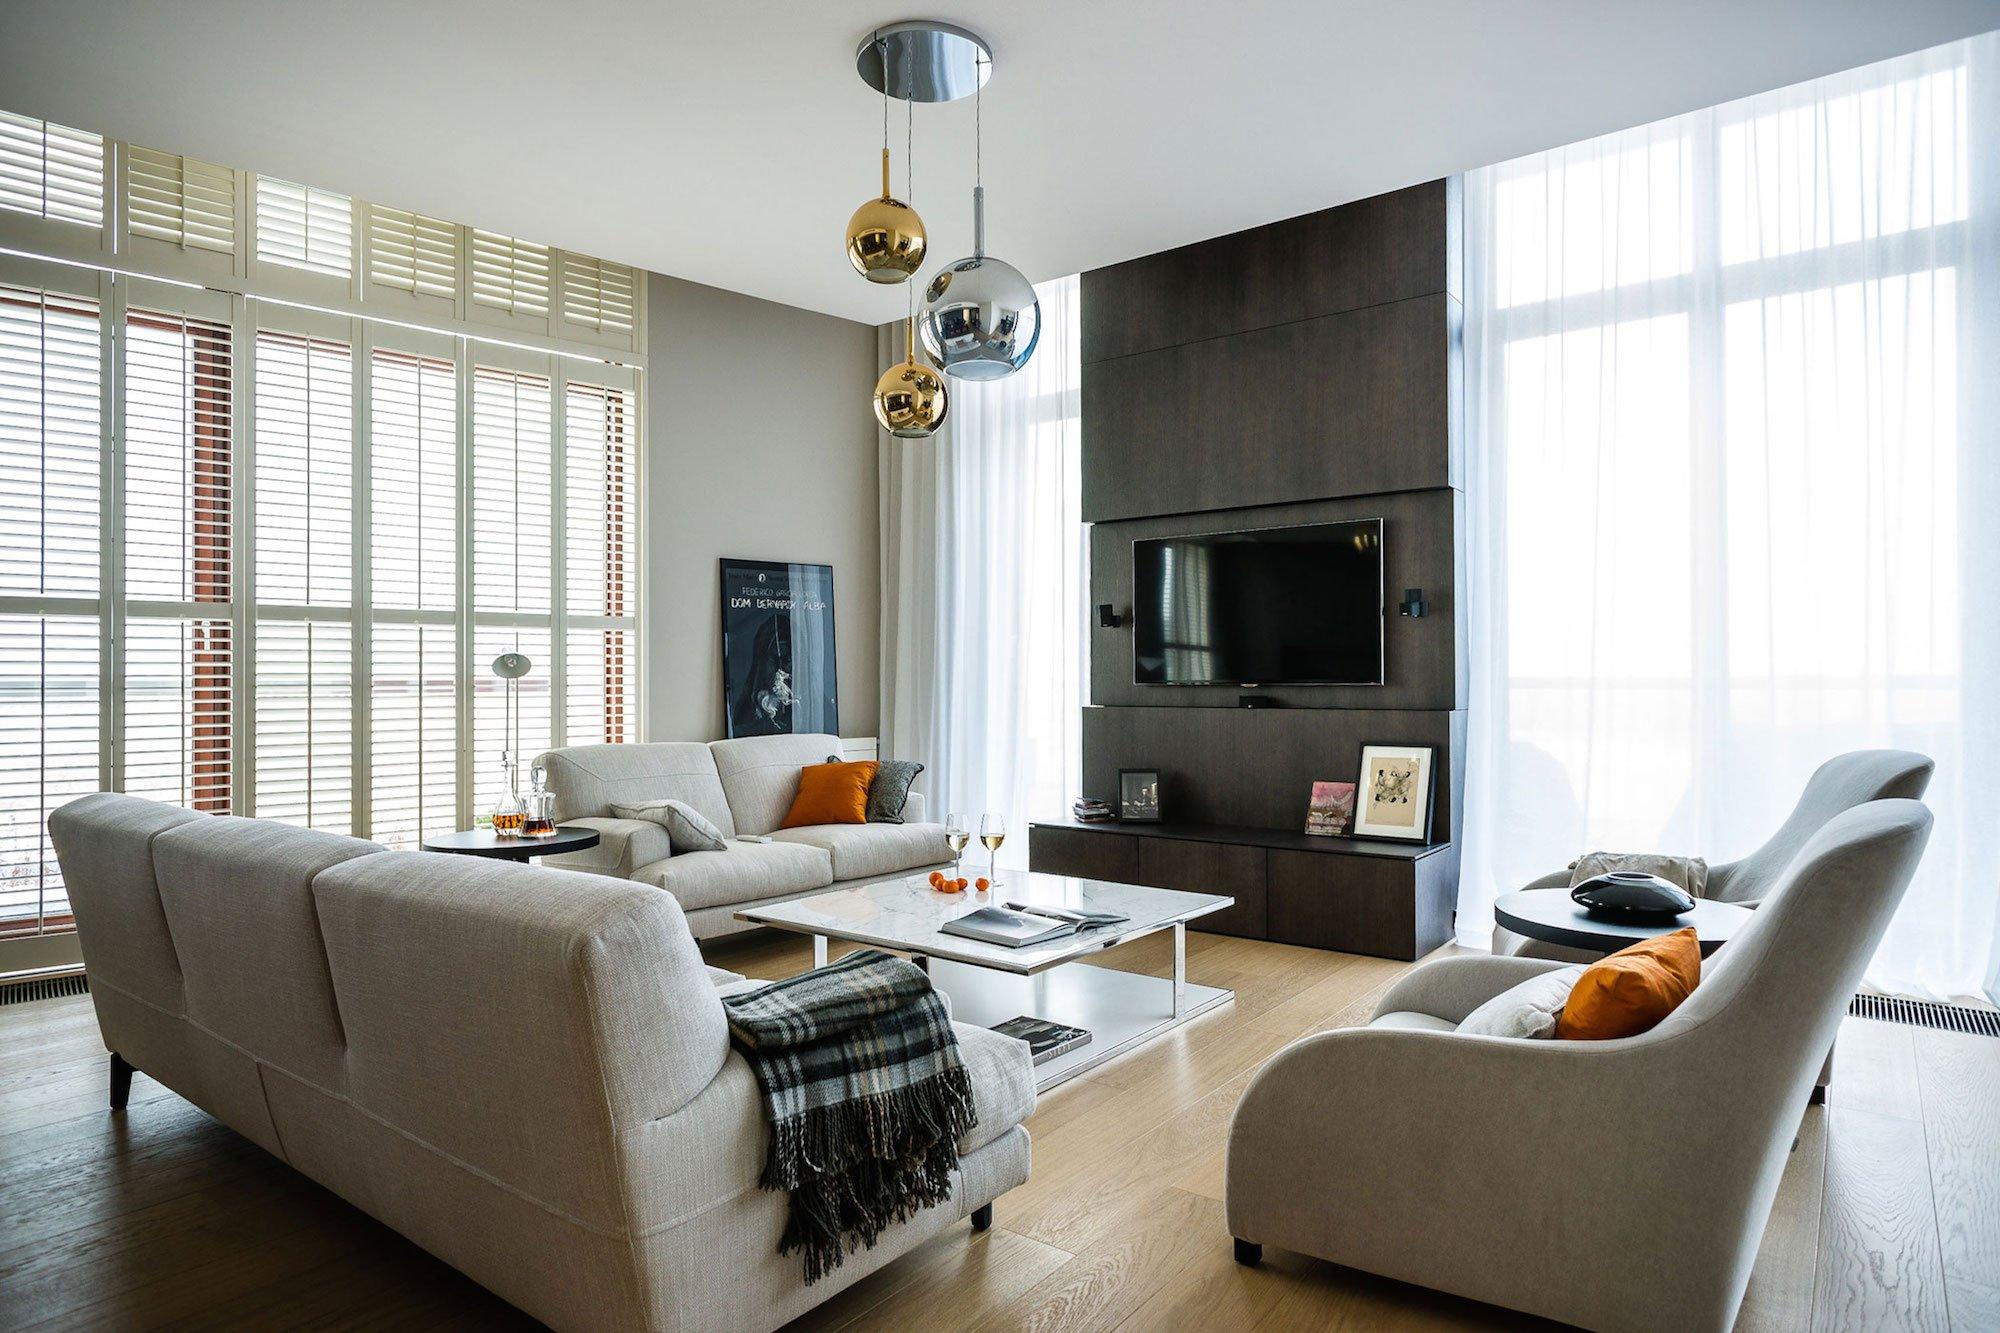 Apartment-in-Nowe-Powisle-01